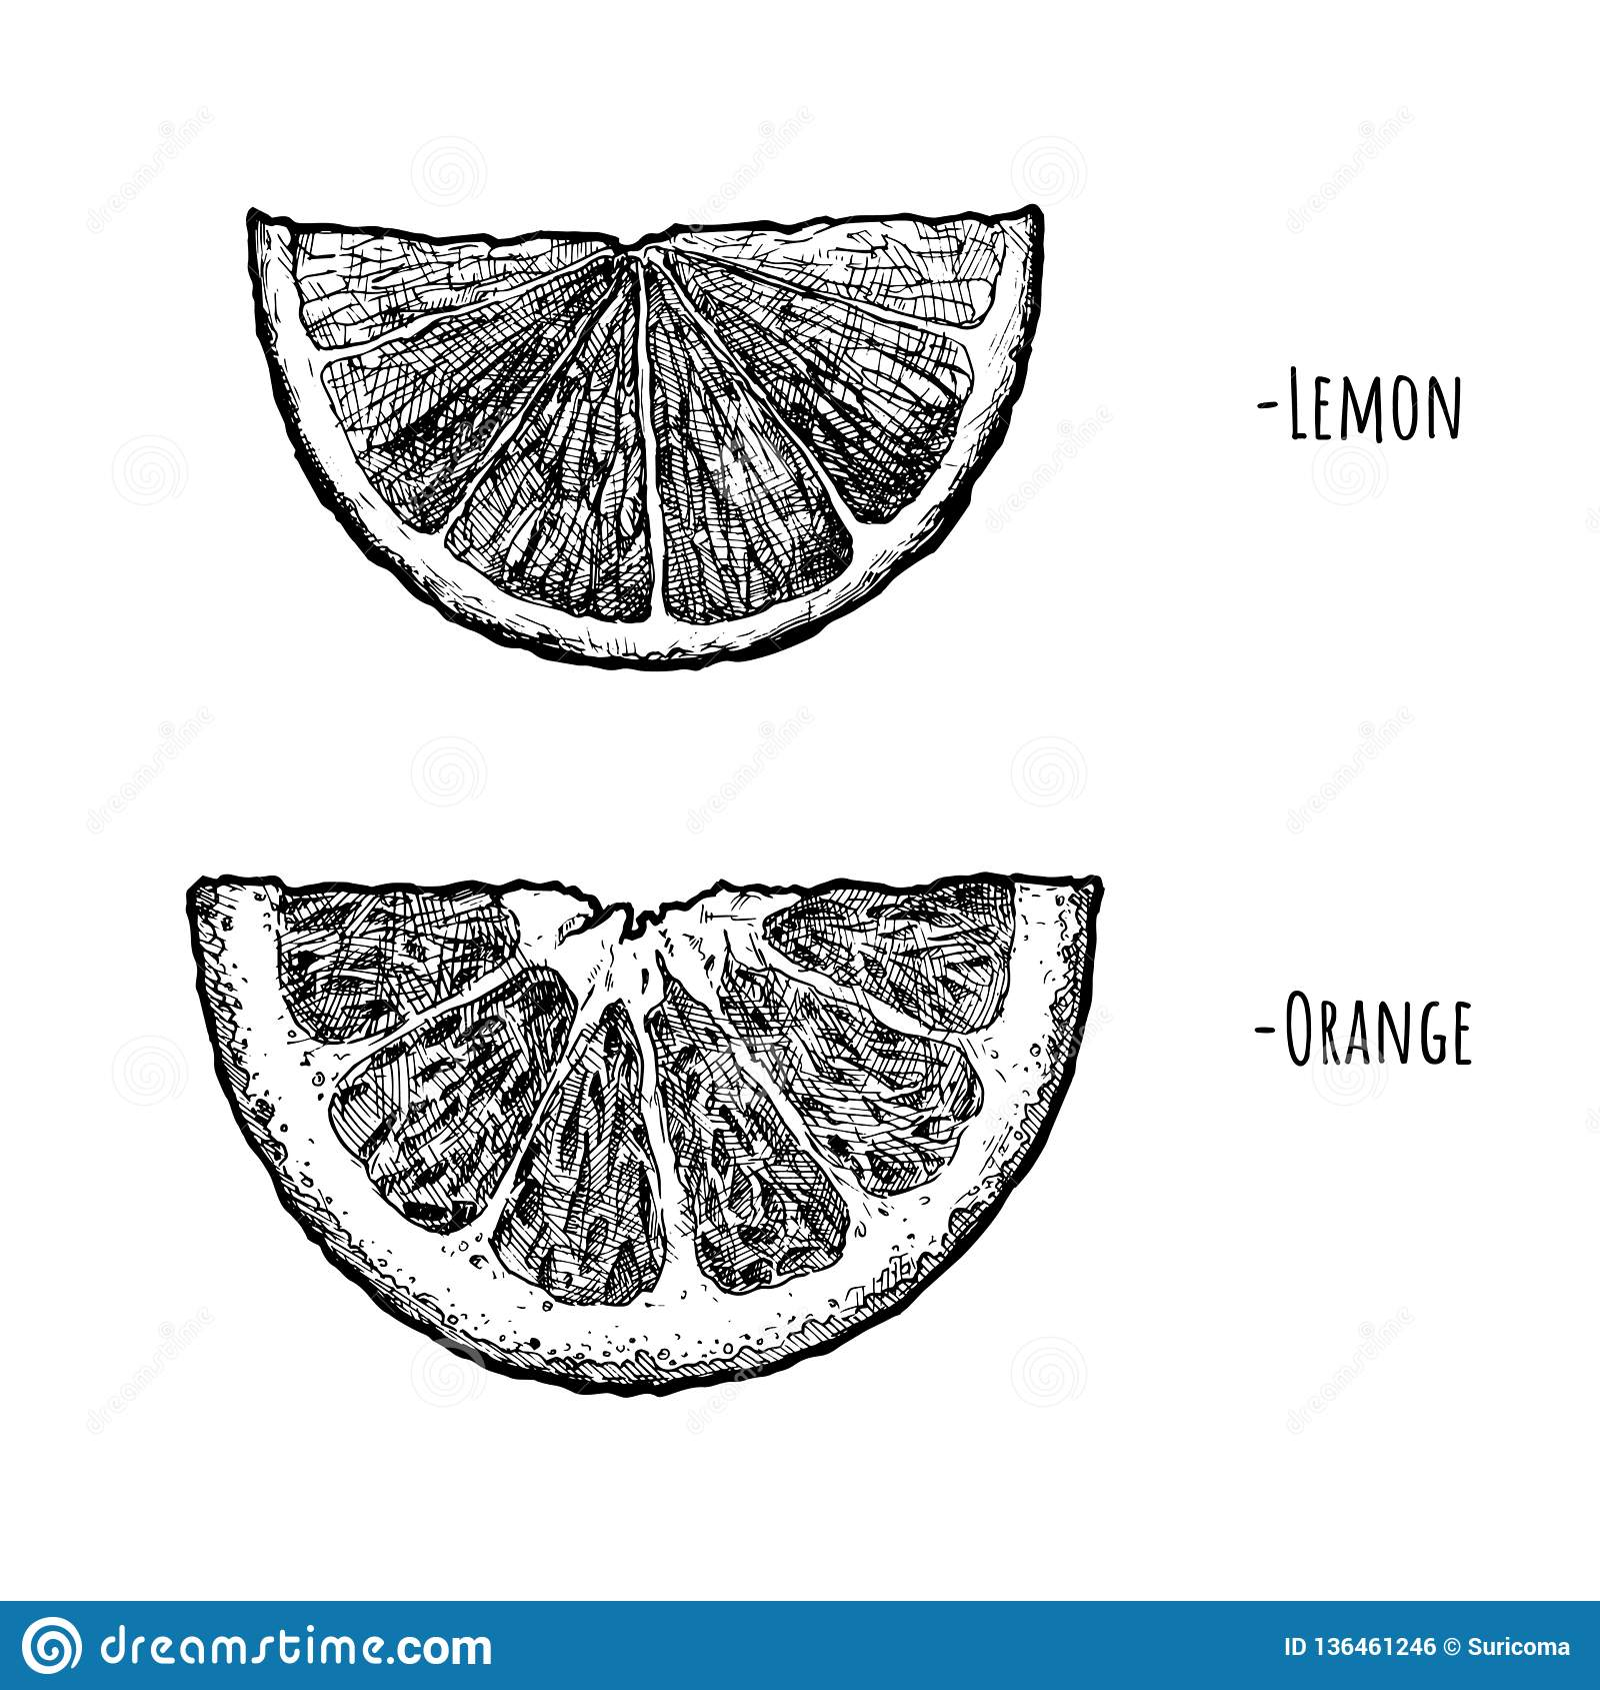 Lemon and orange wedges stock vector. Illustration of ...